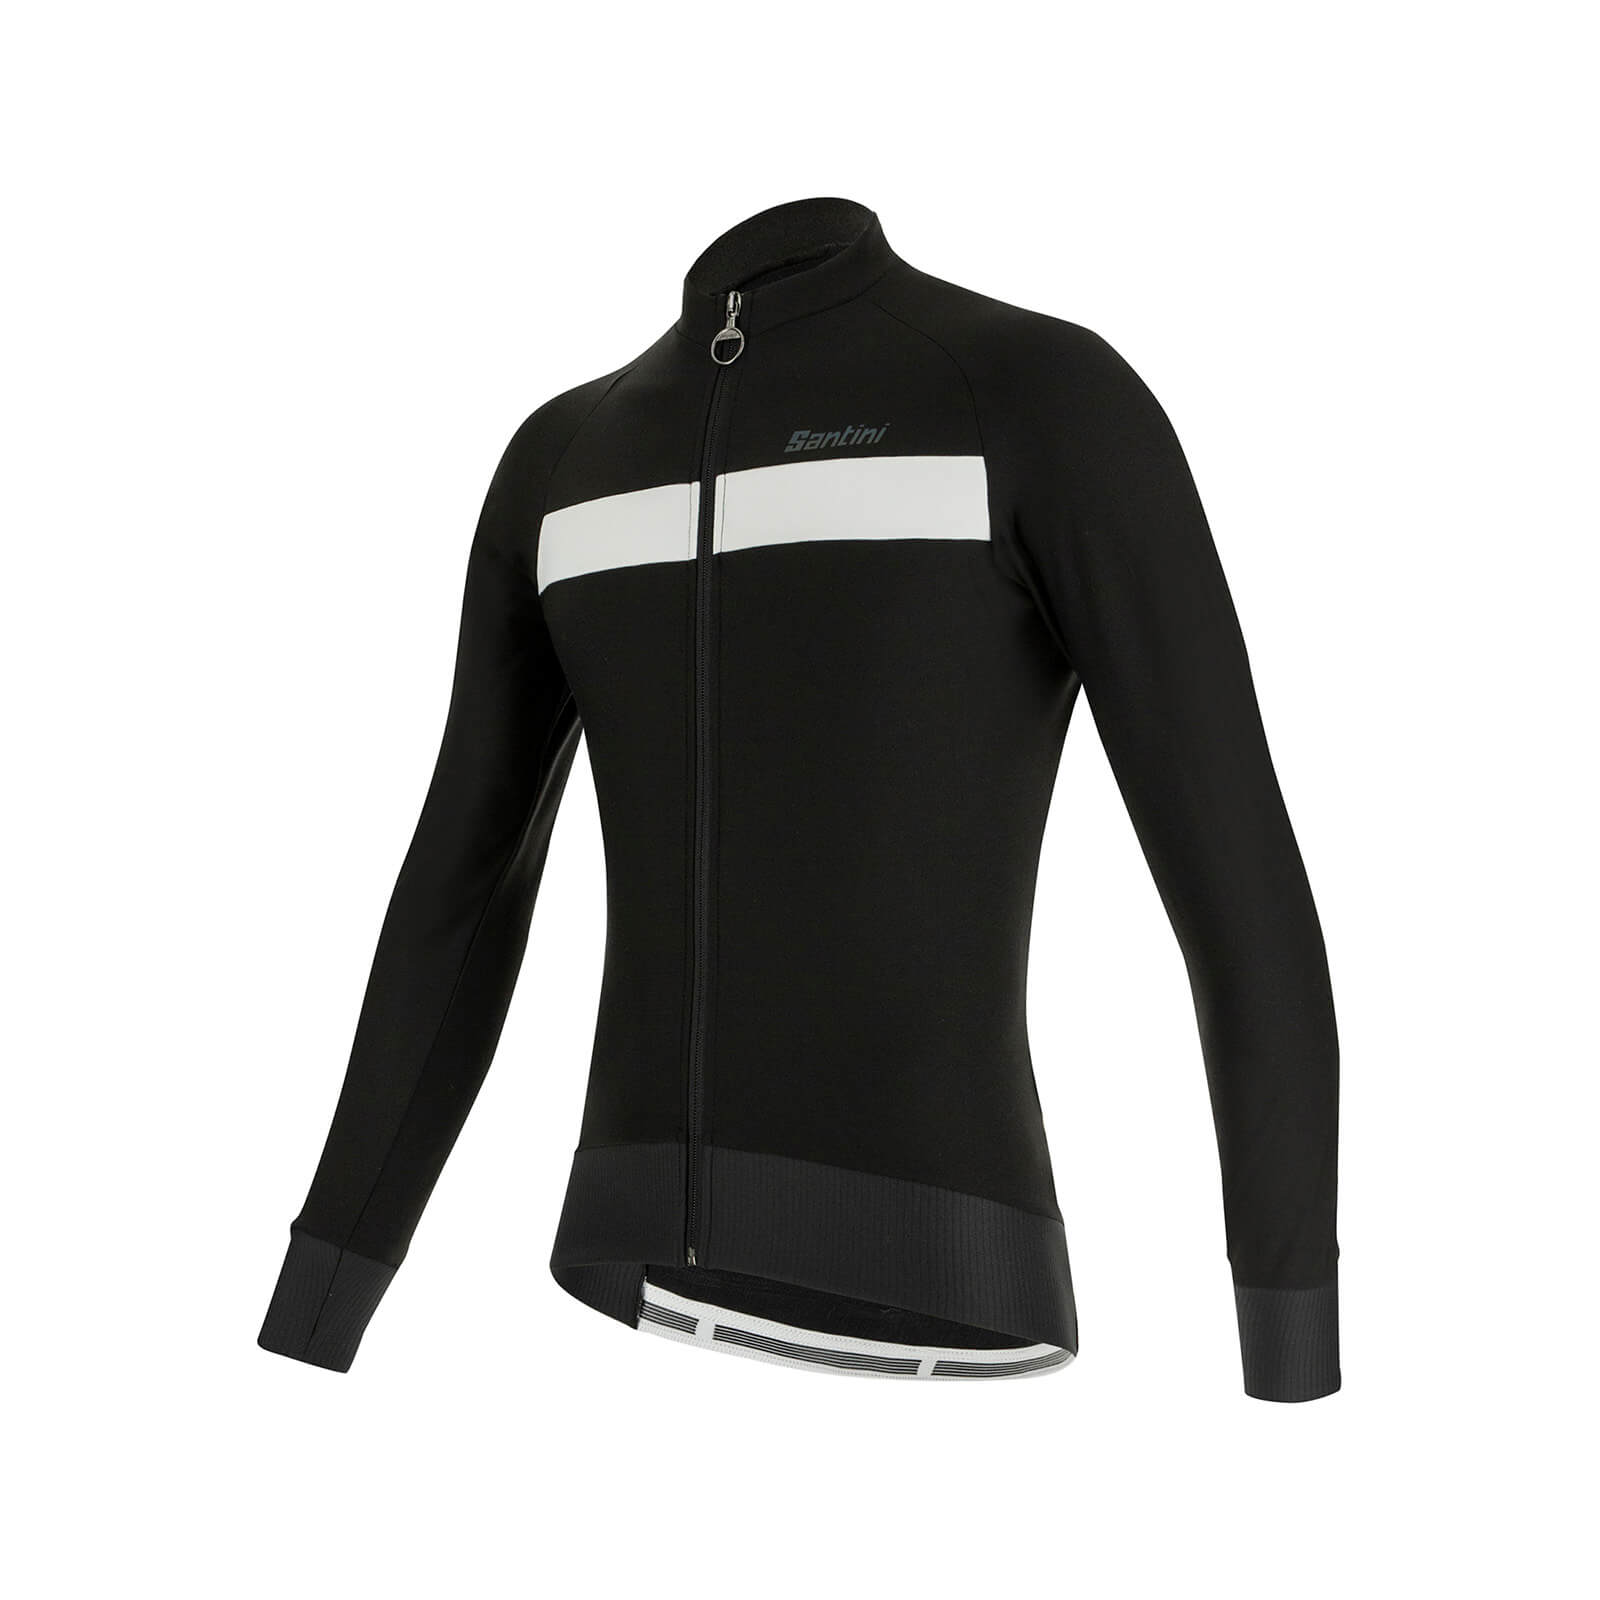 Santini Adapt Wool Long Sleeve Jersey - XL - Black/White